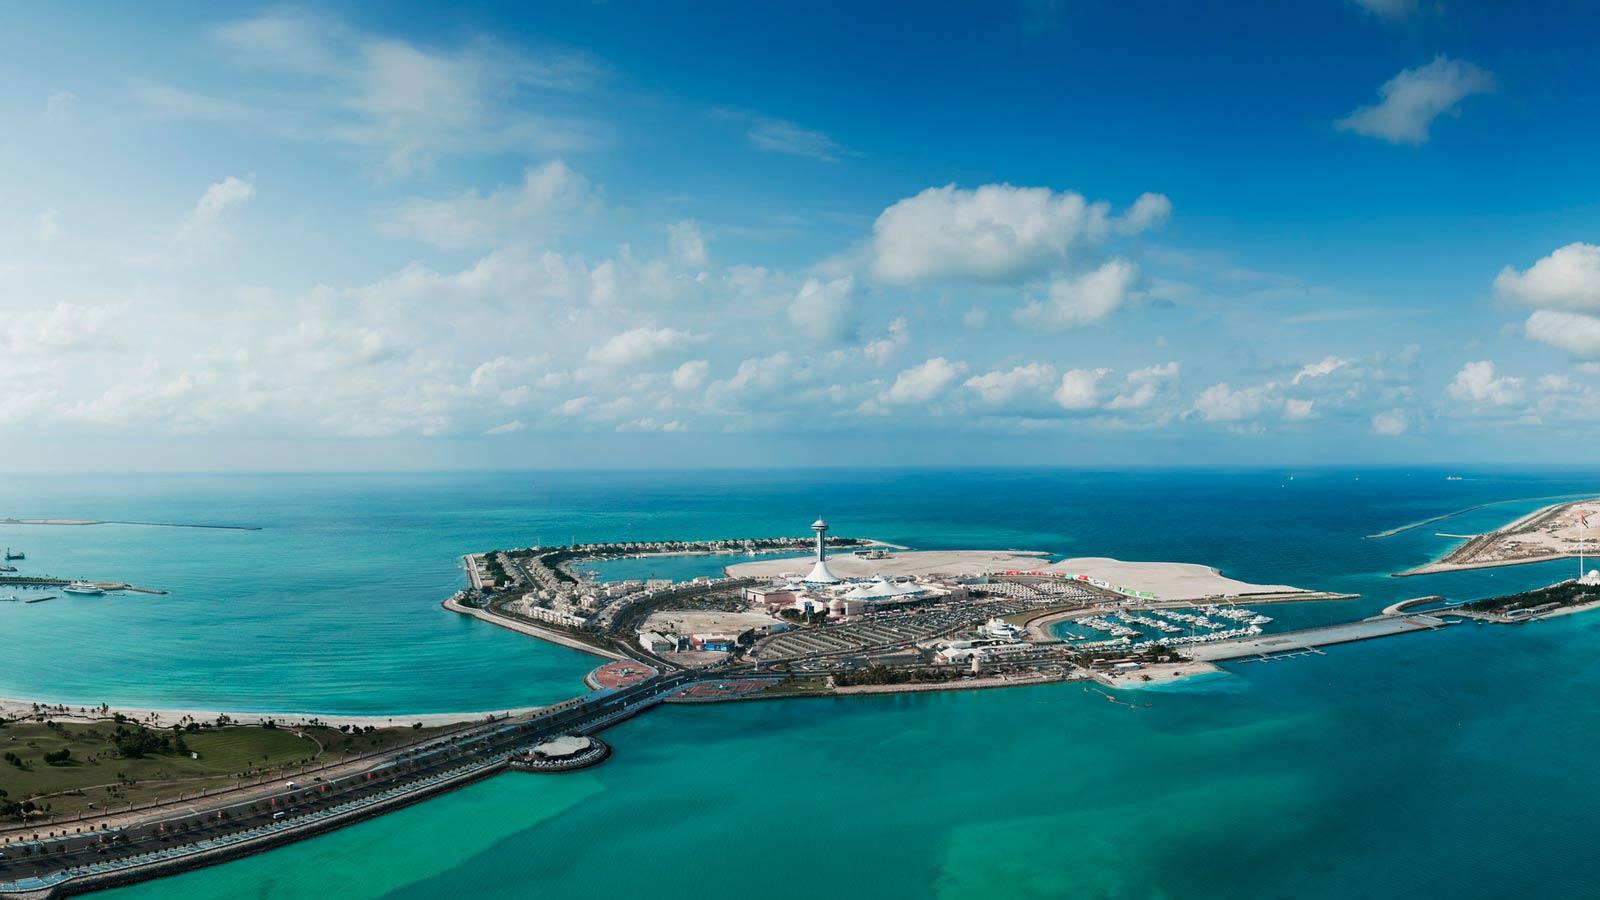 St. Regis Saadiyat Island Resort, Abu Dhabi Review